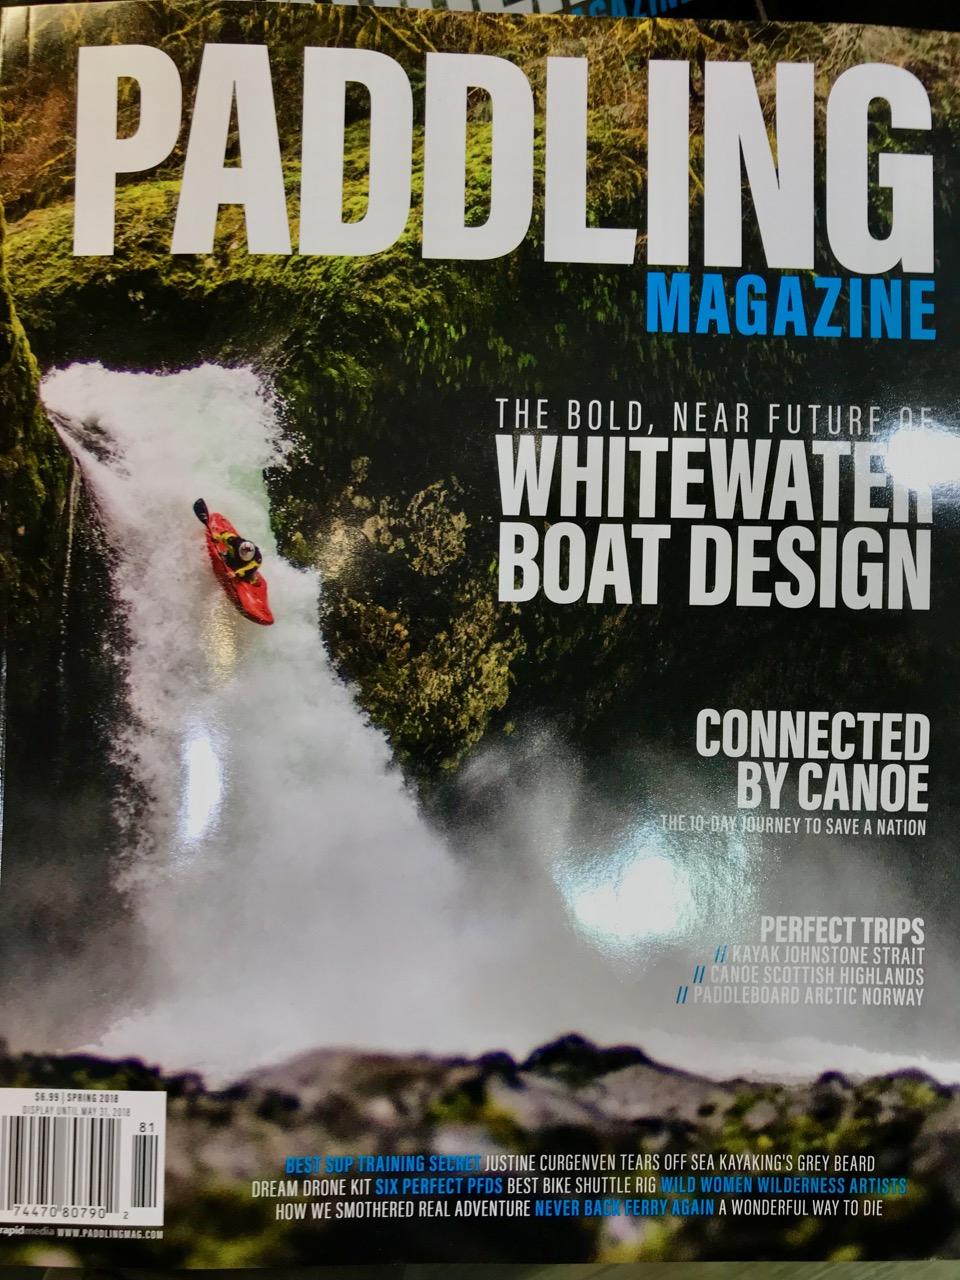 PaddlingMagazineSpring2018.jpg